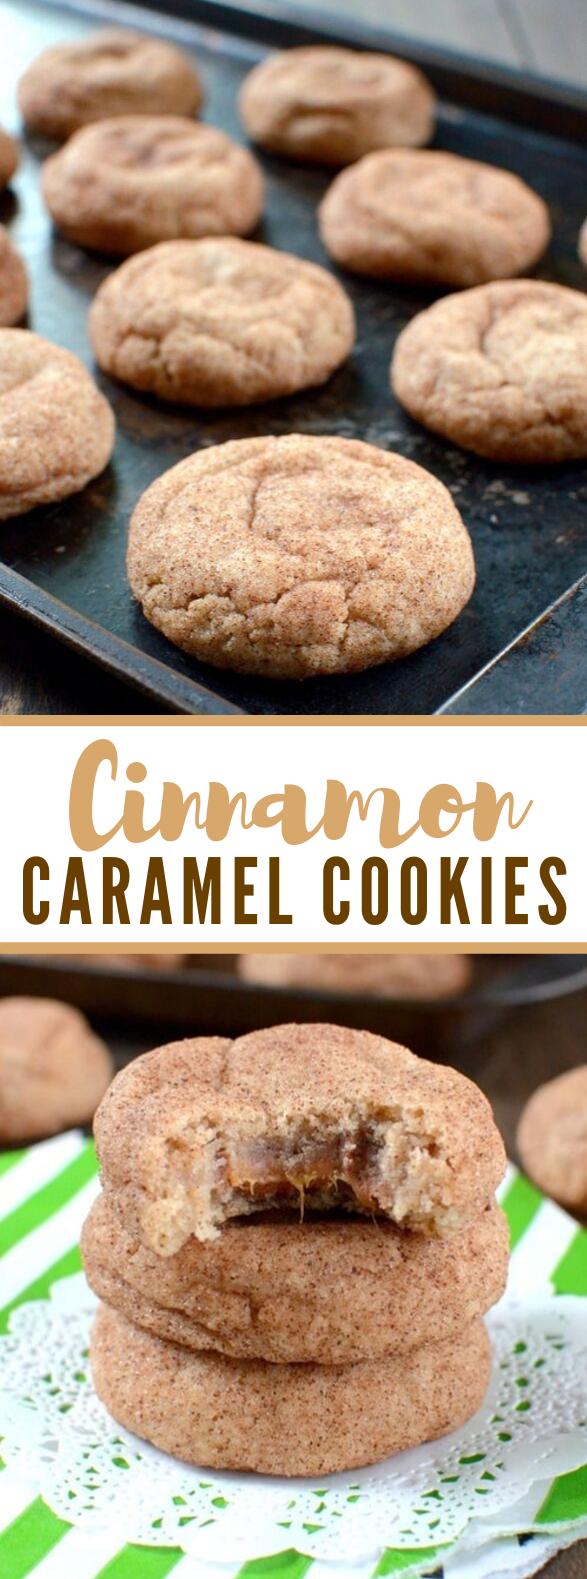 Cinnamon Caramel Cookies #desserts #sweets